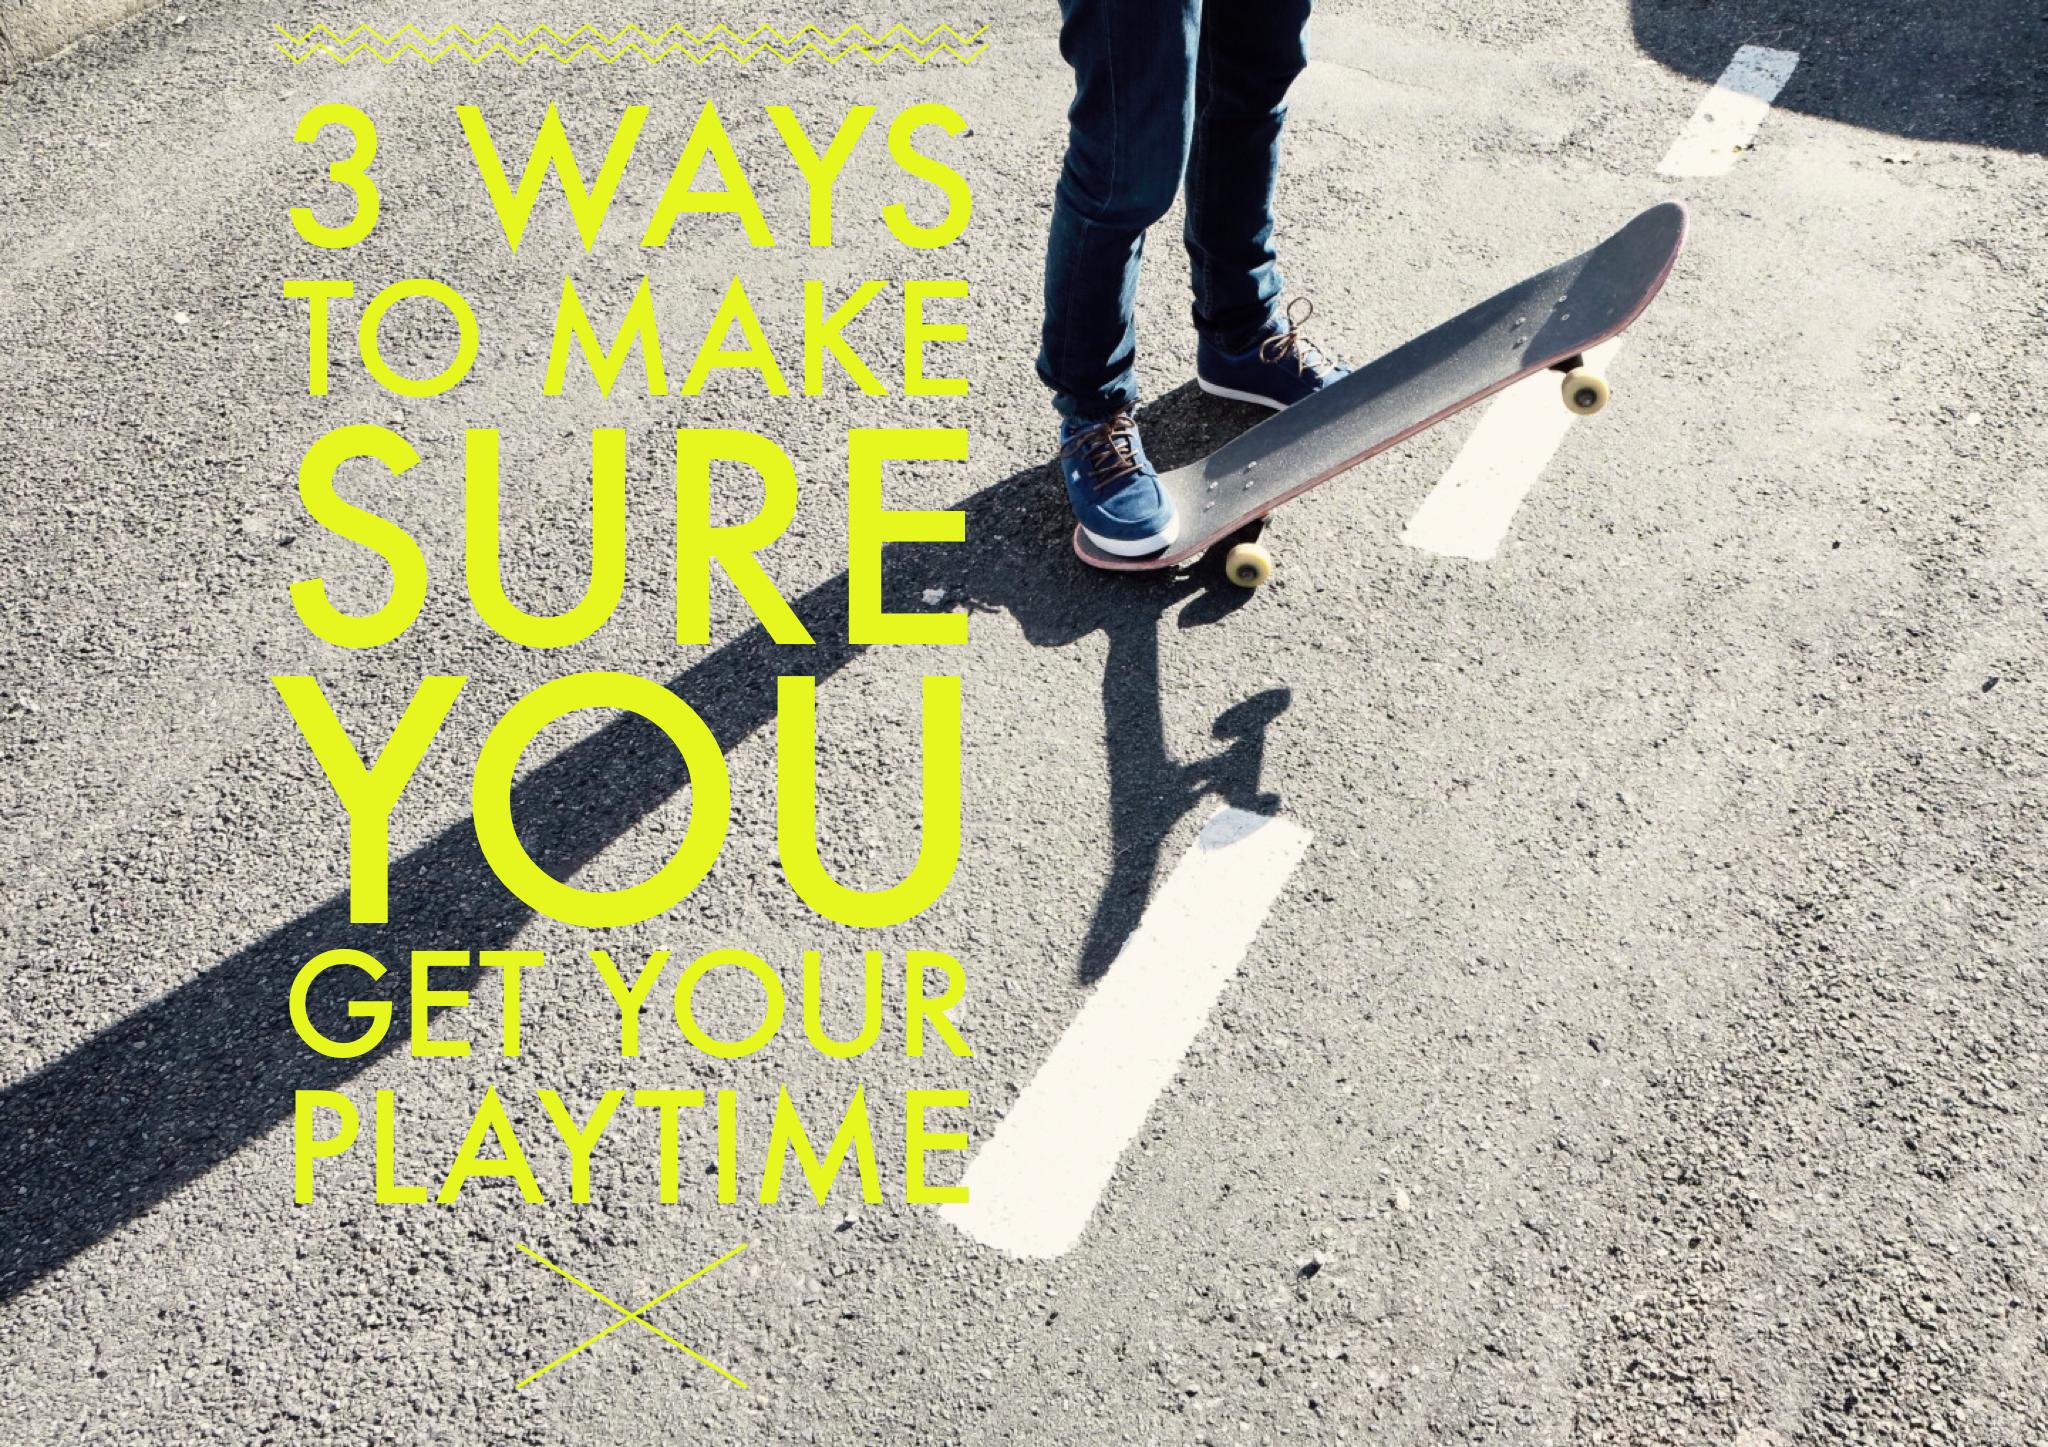 3 ways to get playtime